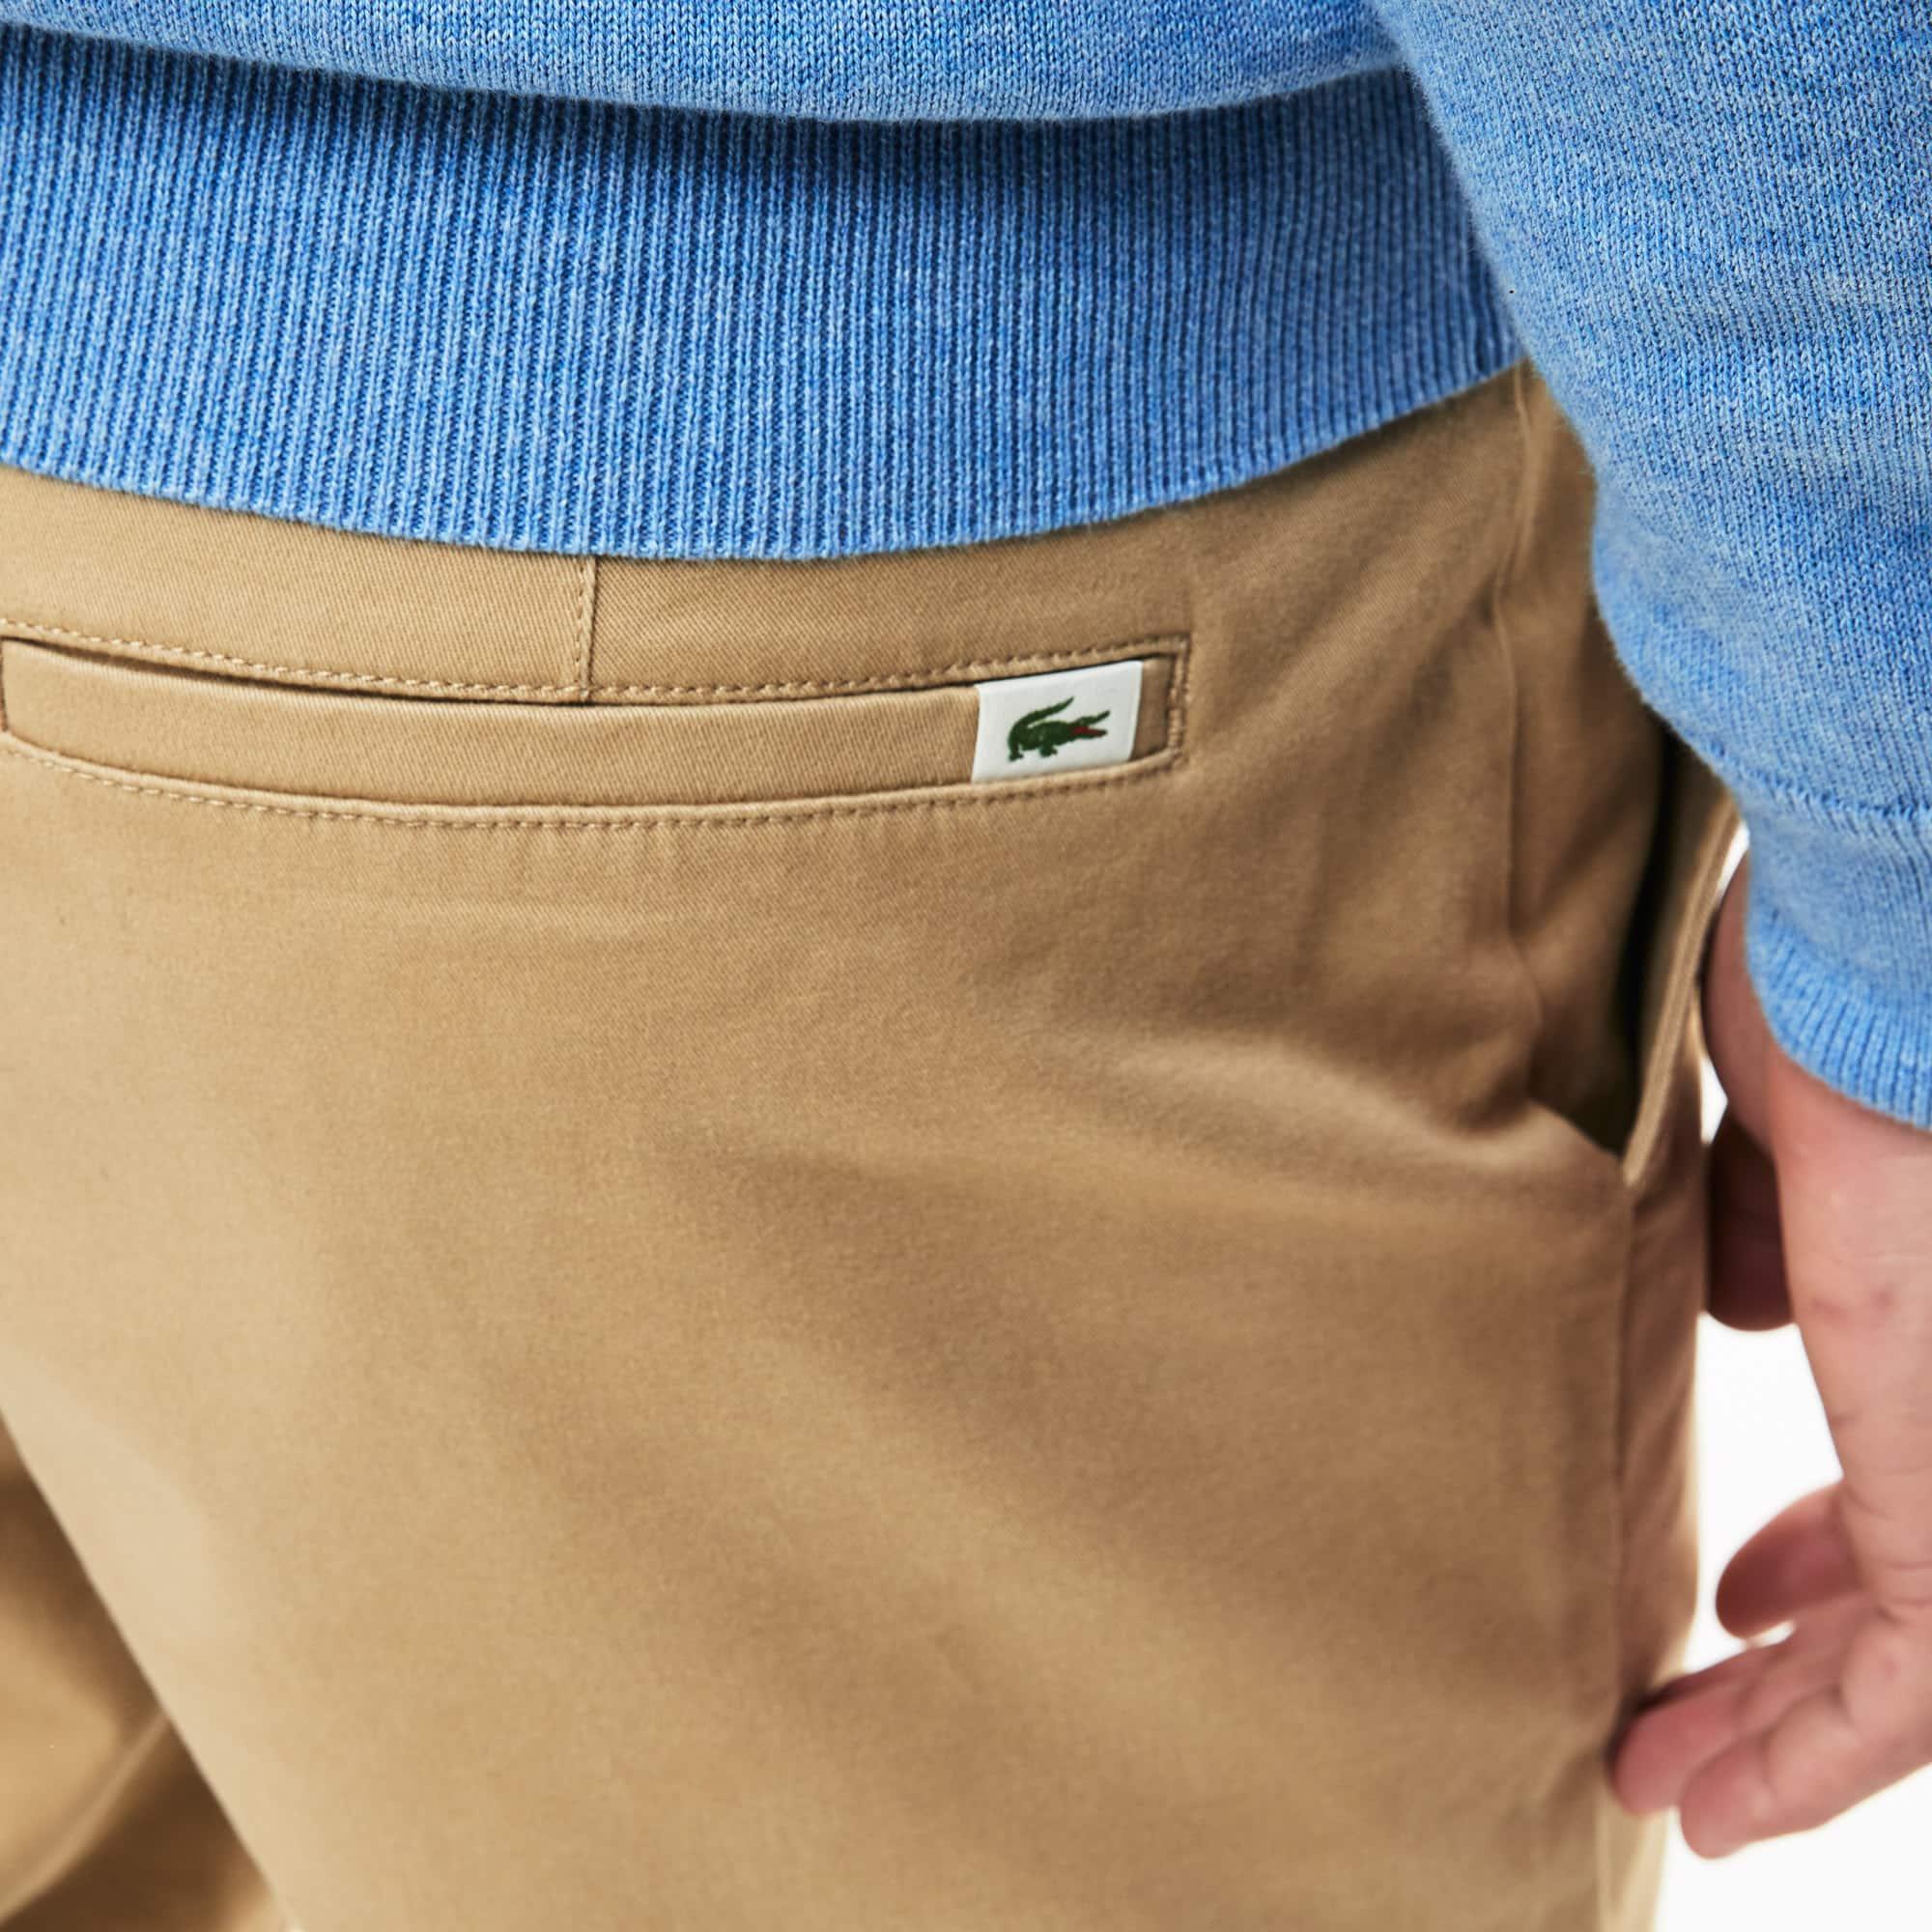 655a5ad5f4 Men's Regular Fit Cotton Gabardine Chino Pants   LACOSTE